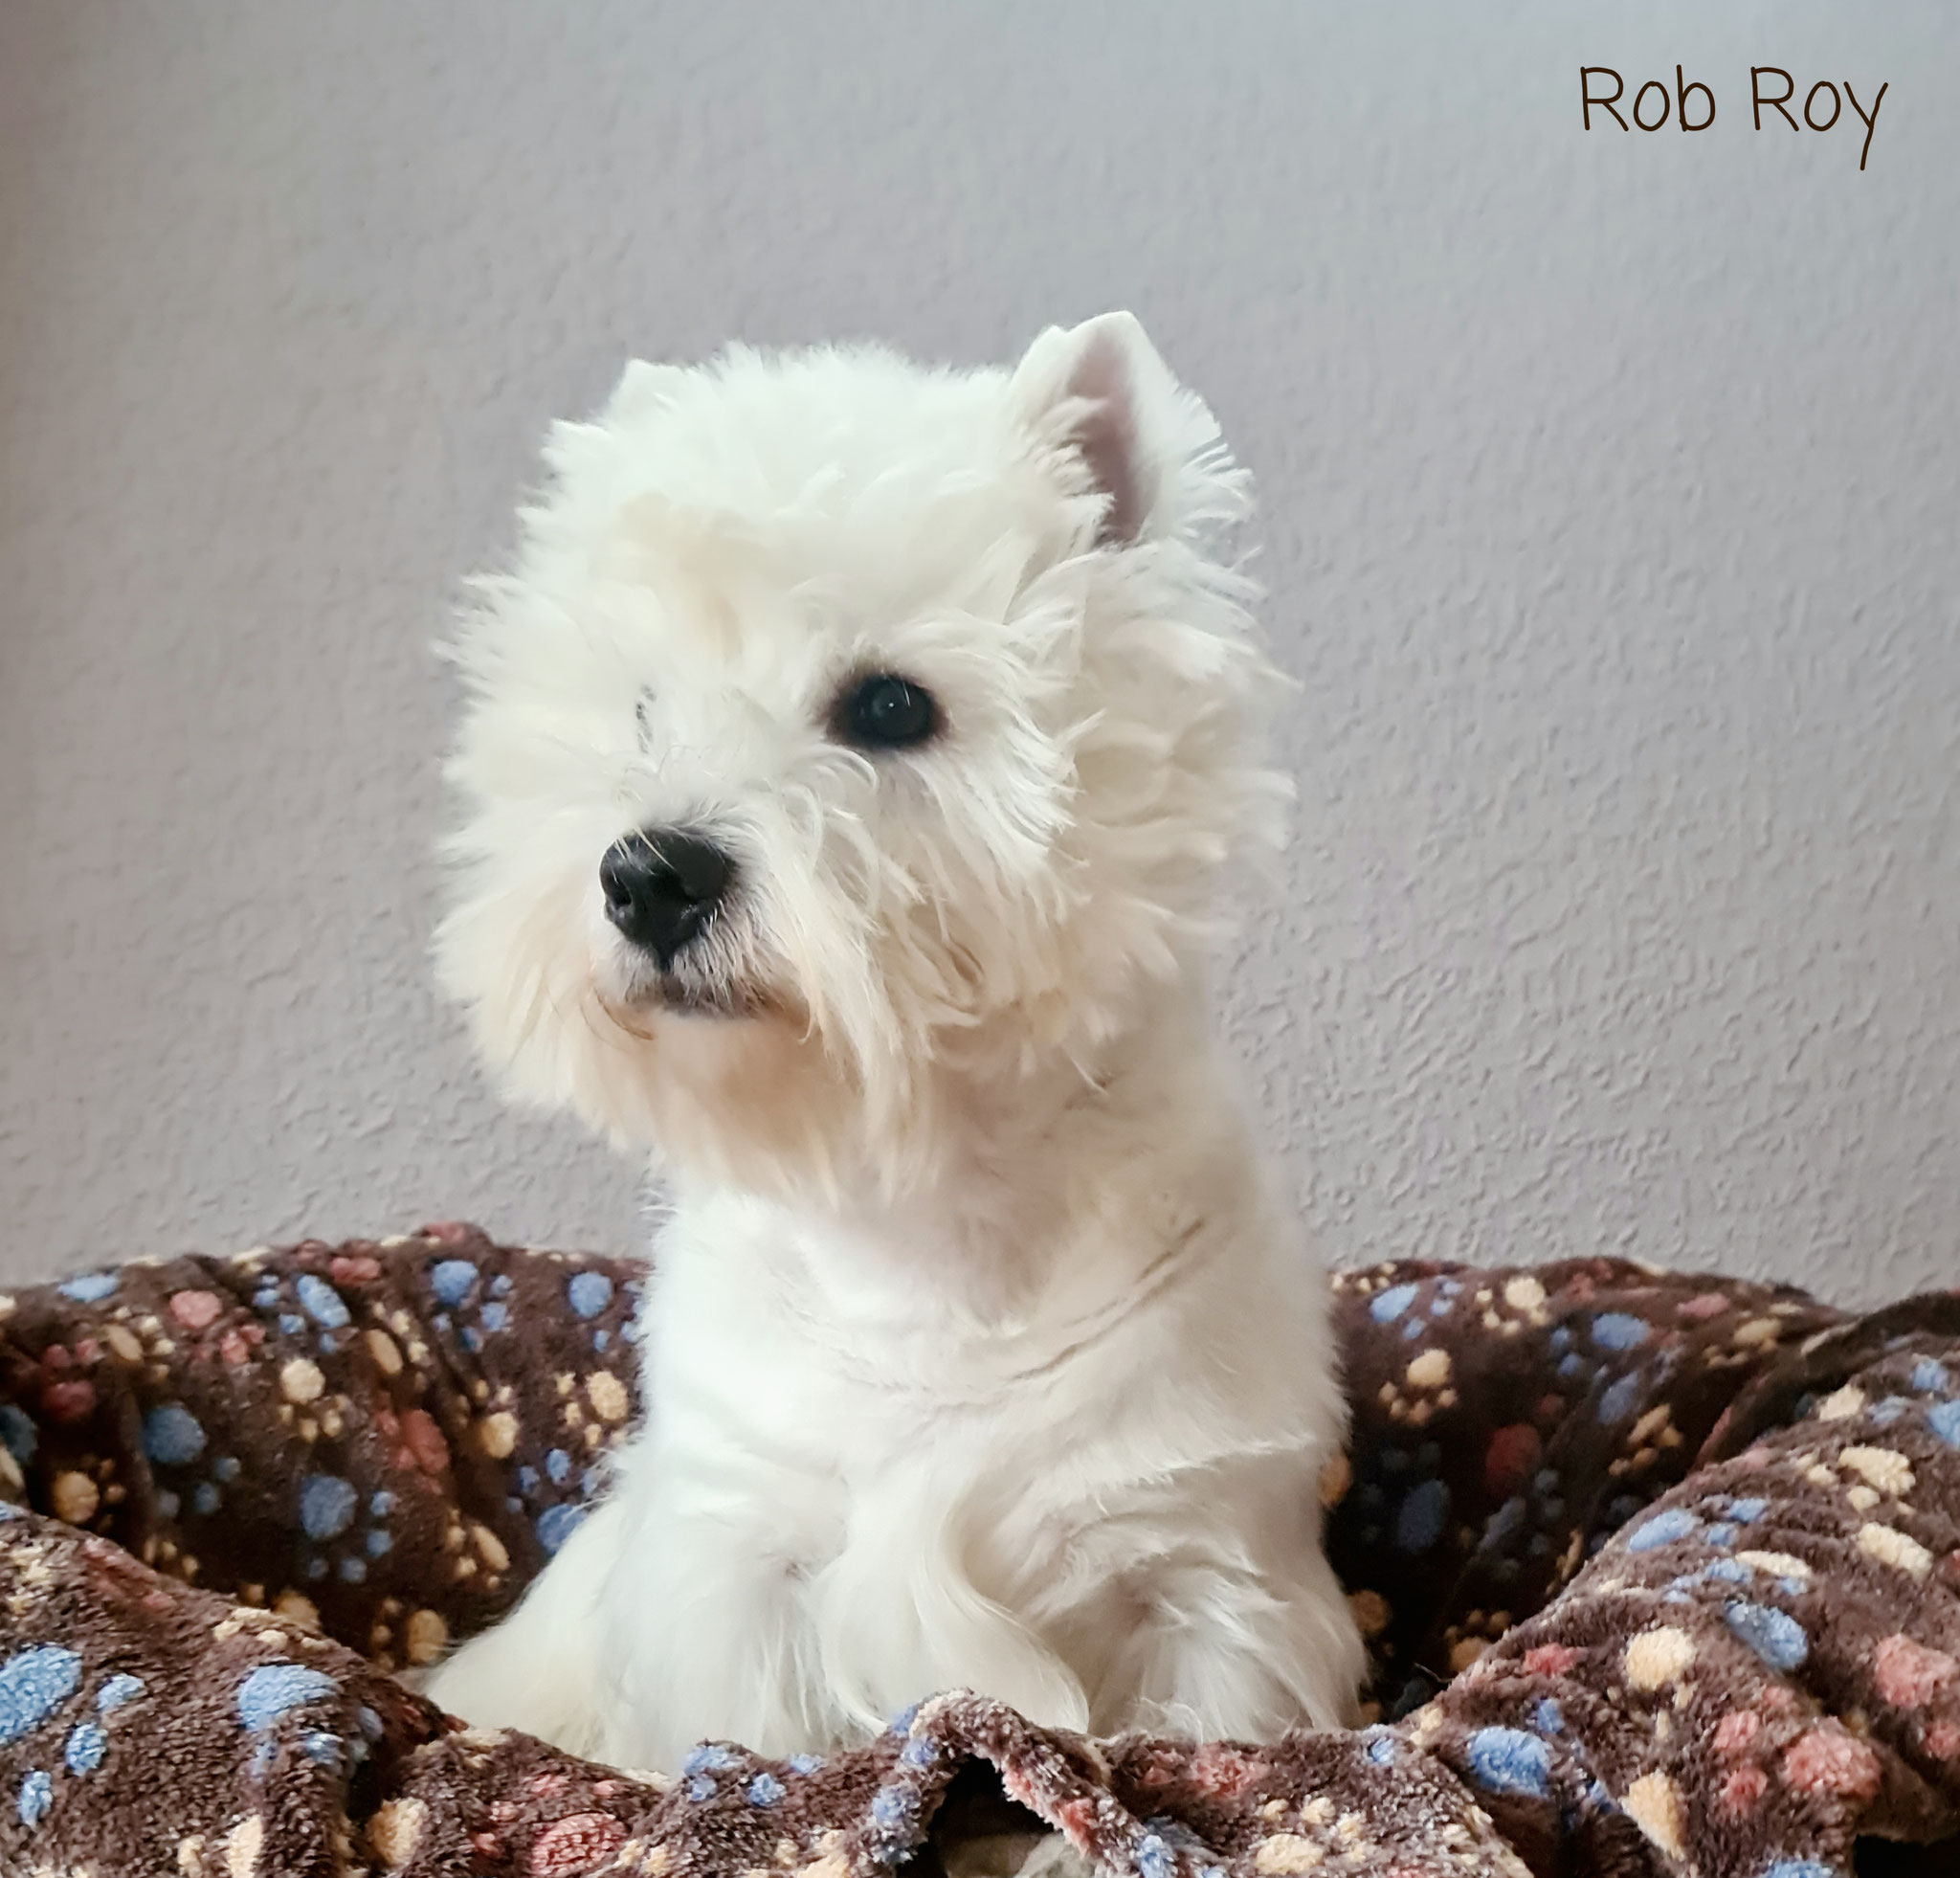 Rob Roy 02/2021